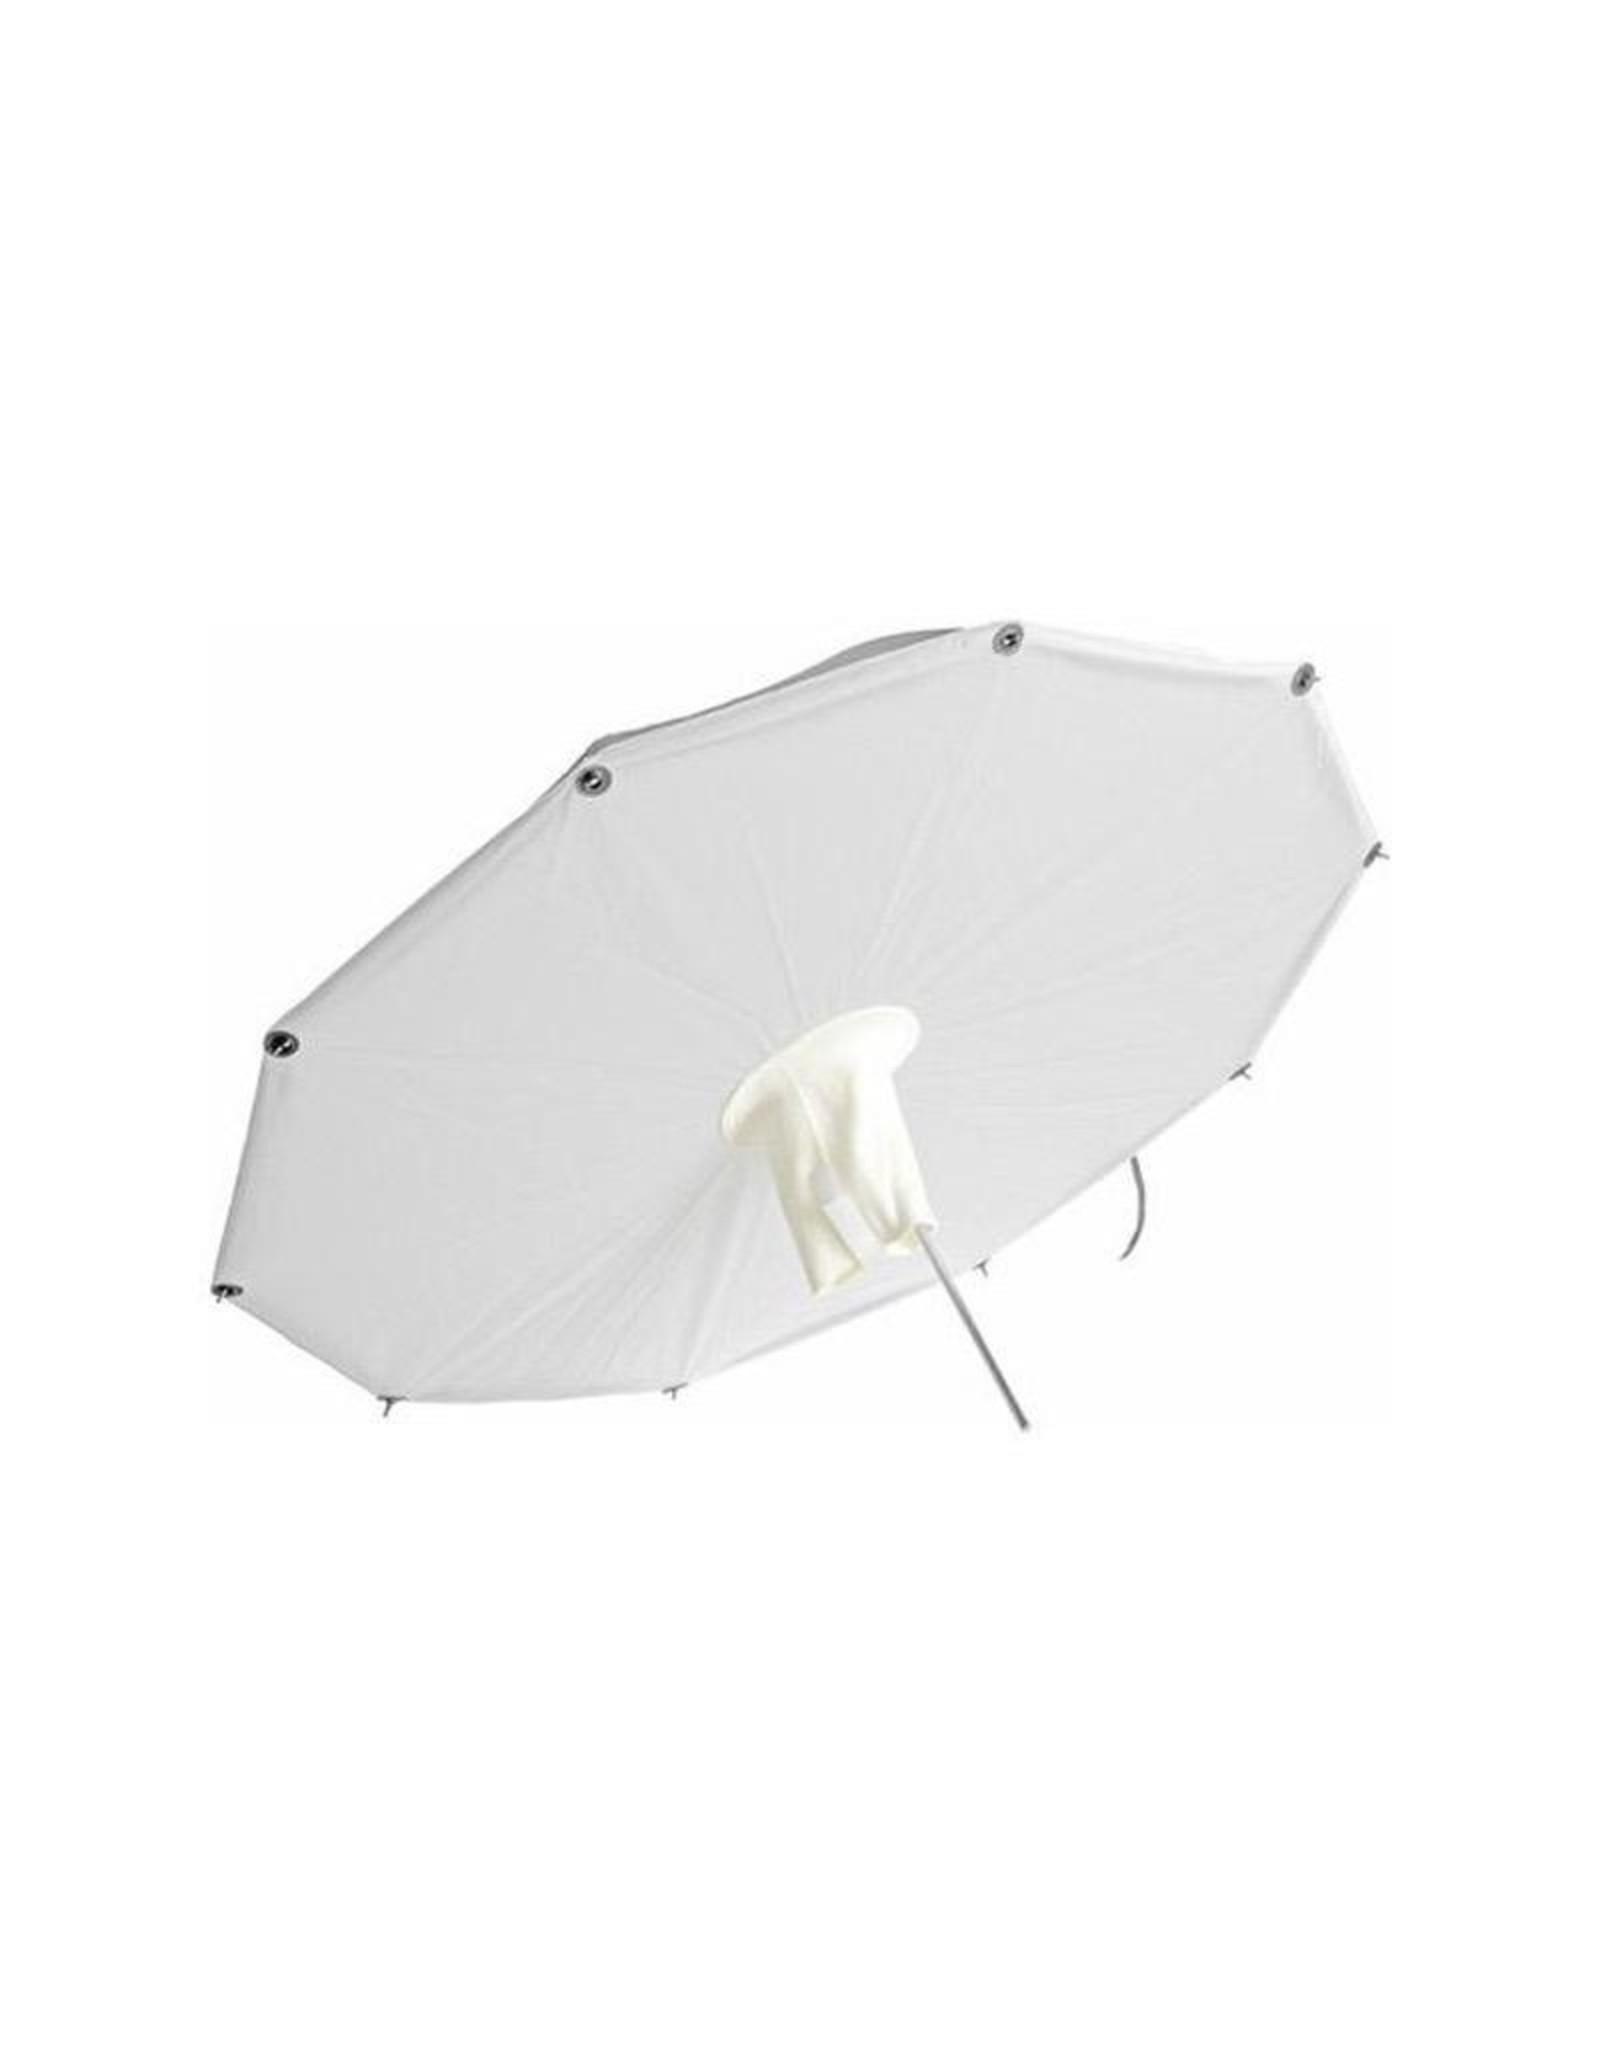 "Photek Photek Umbrella - Softlighter II with 7mm & 8mm Shafts - 36"""